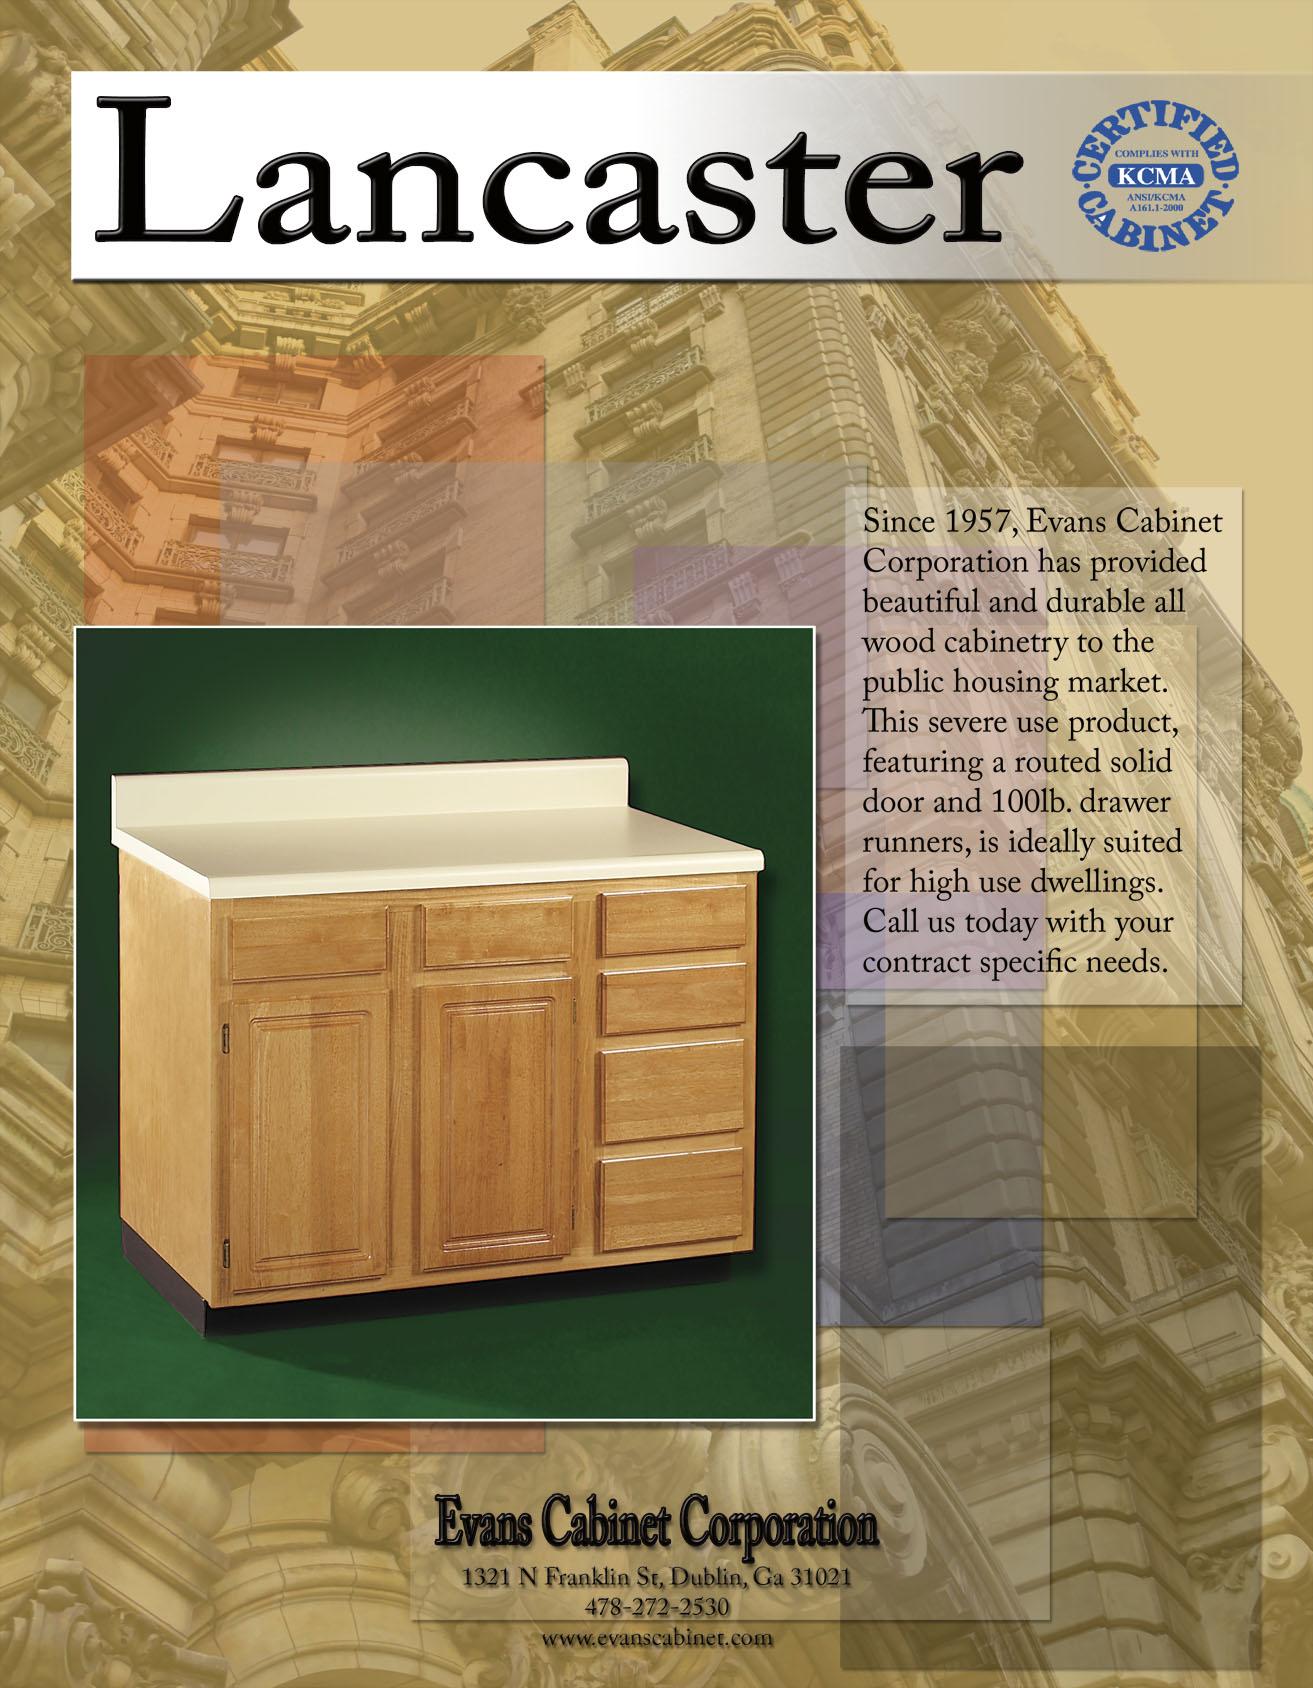 LancasterFinal.jpg